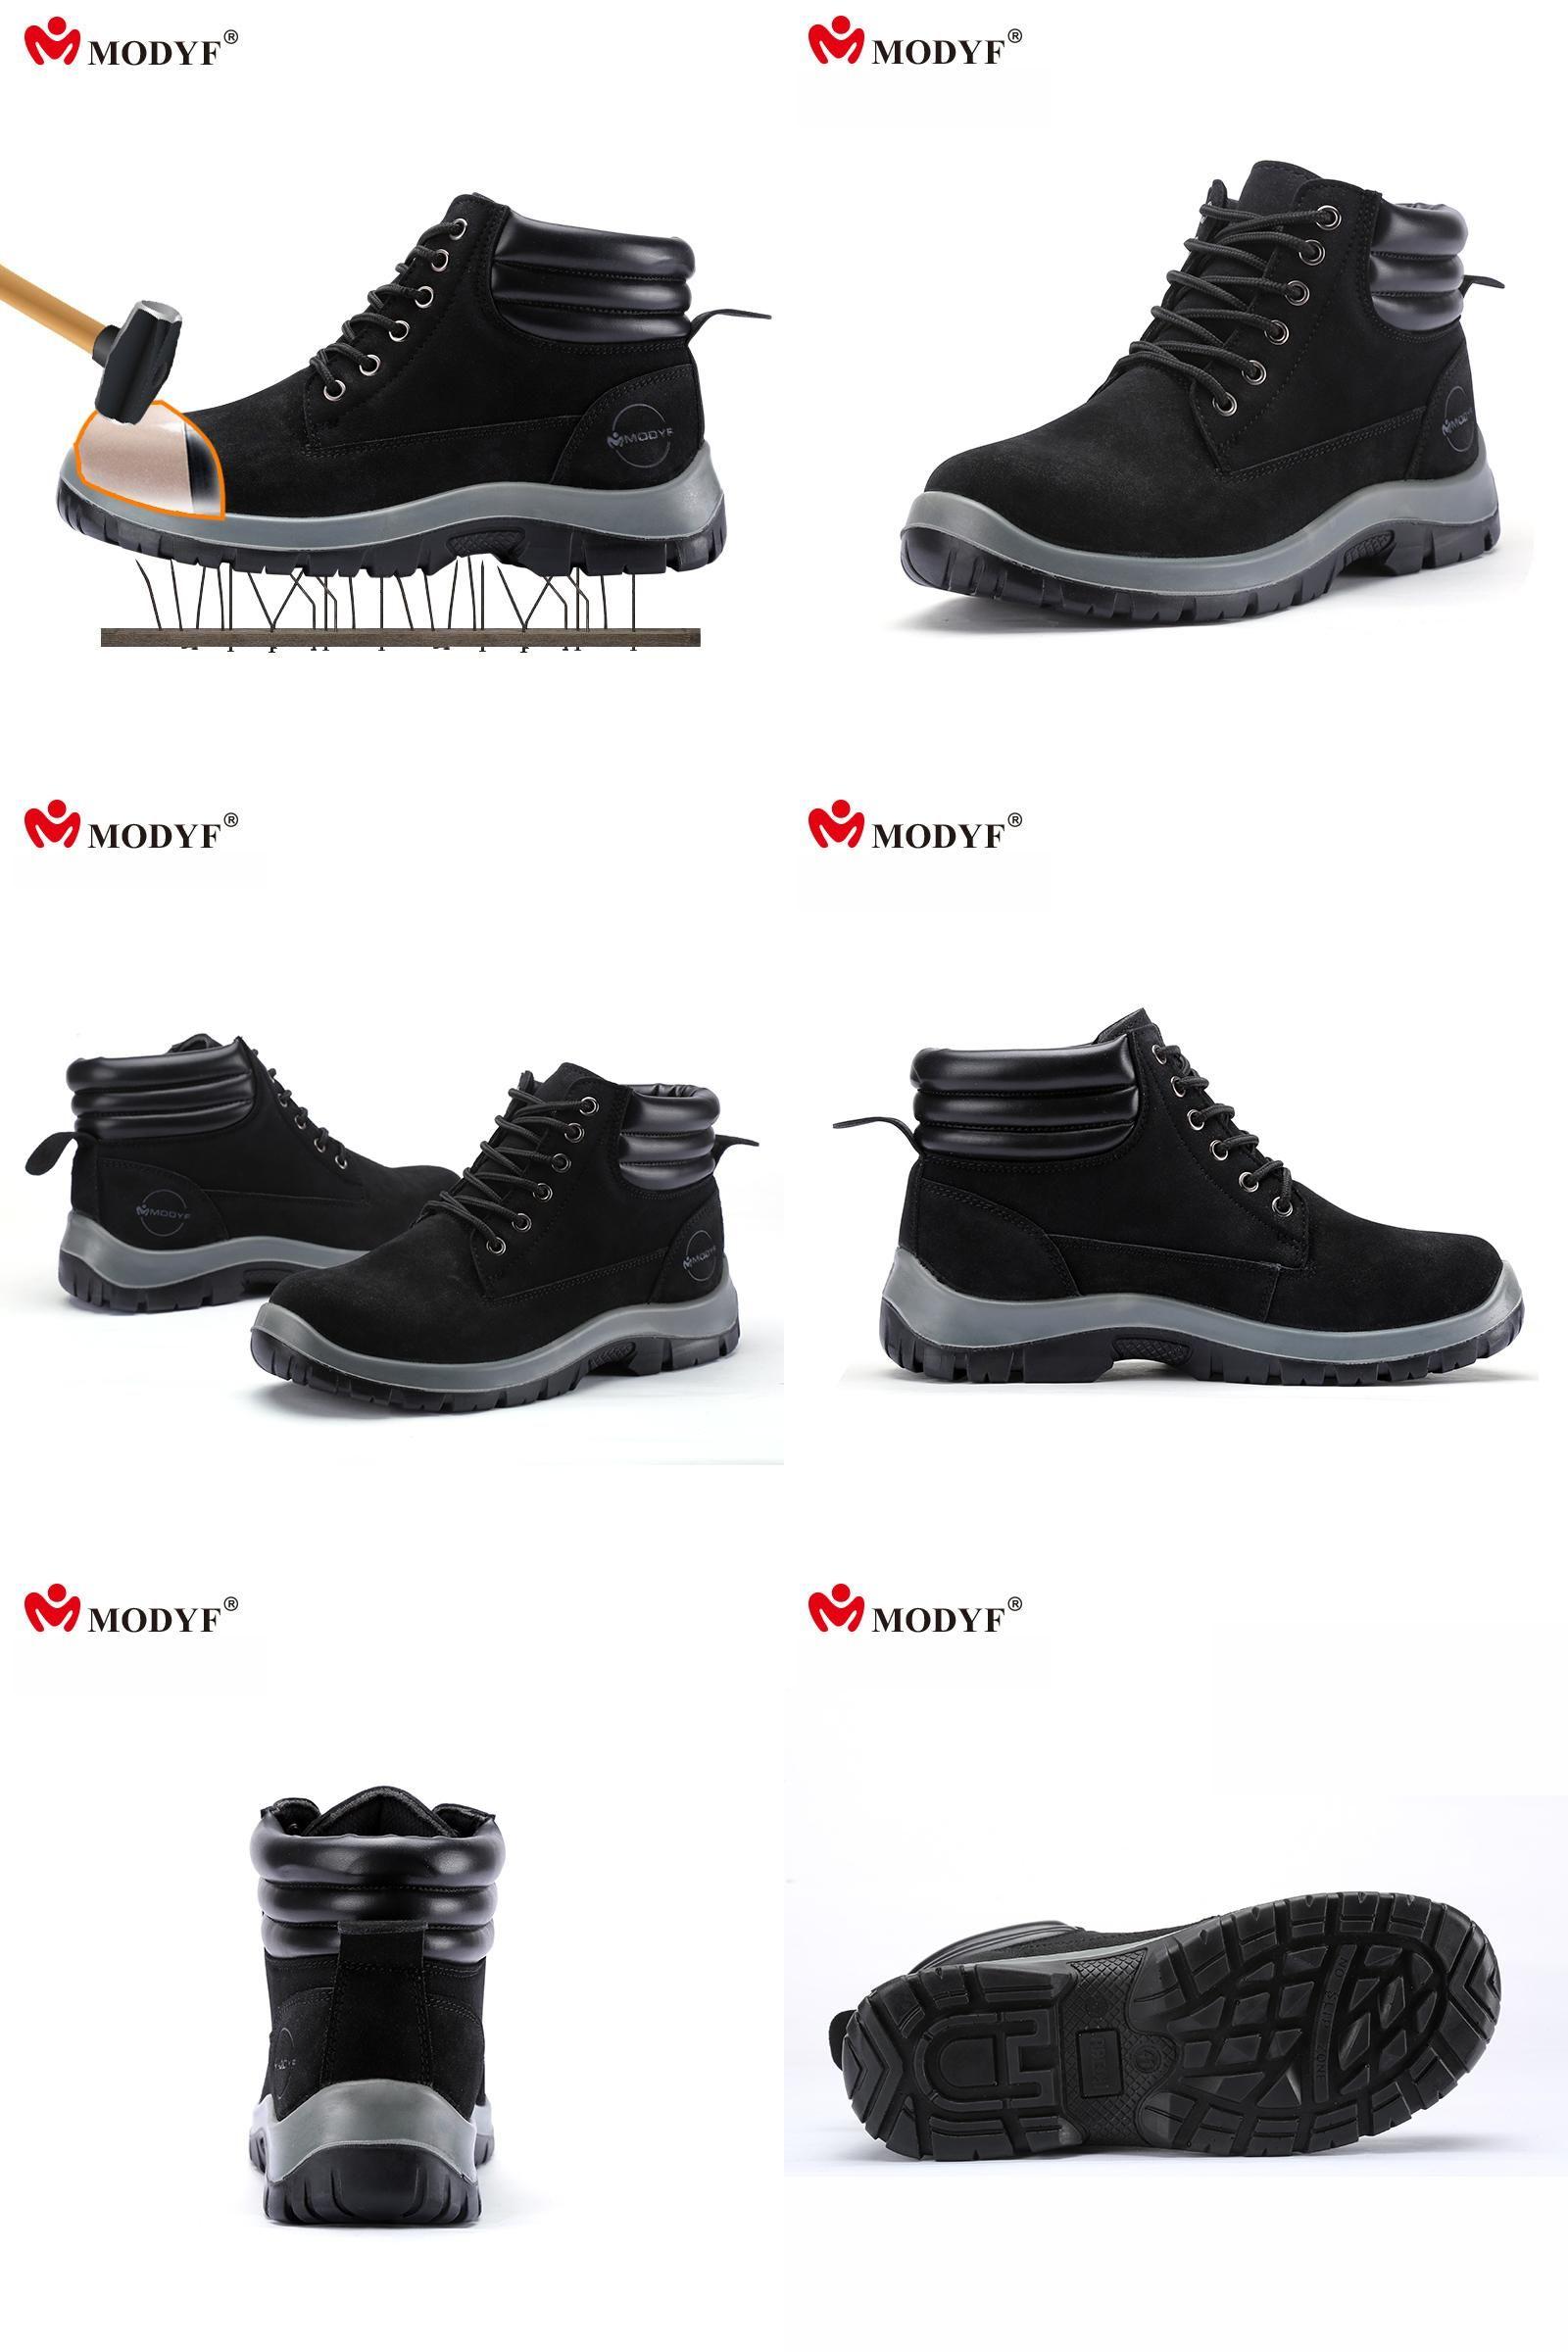 Men's Shoes Modyf Men Steel Toe Cap Work Safety Shoes Outdoor Ankle Boots Fashion Puncture Proof Footwear Online Shop